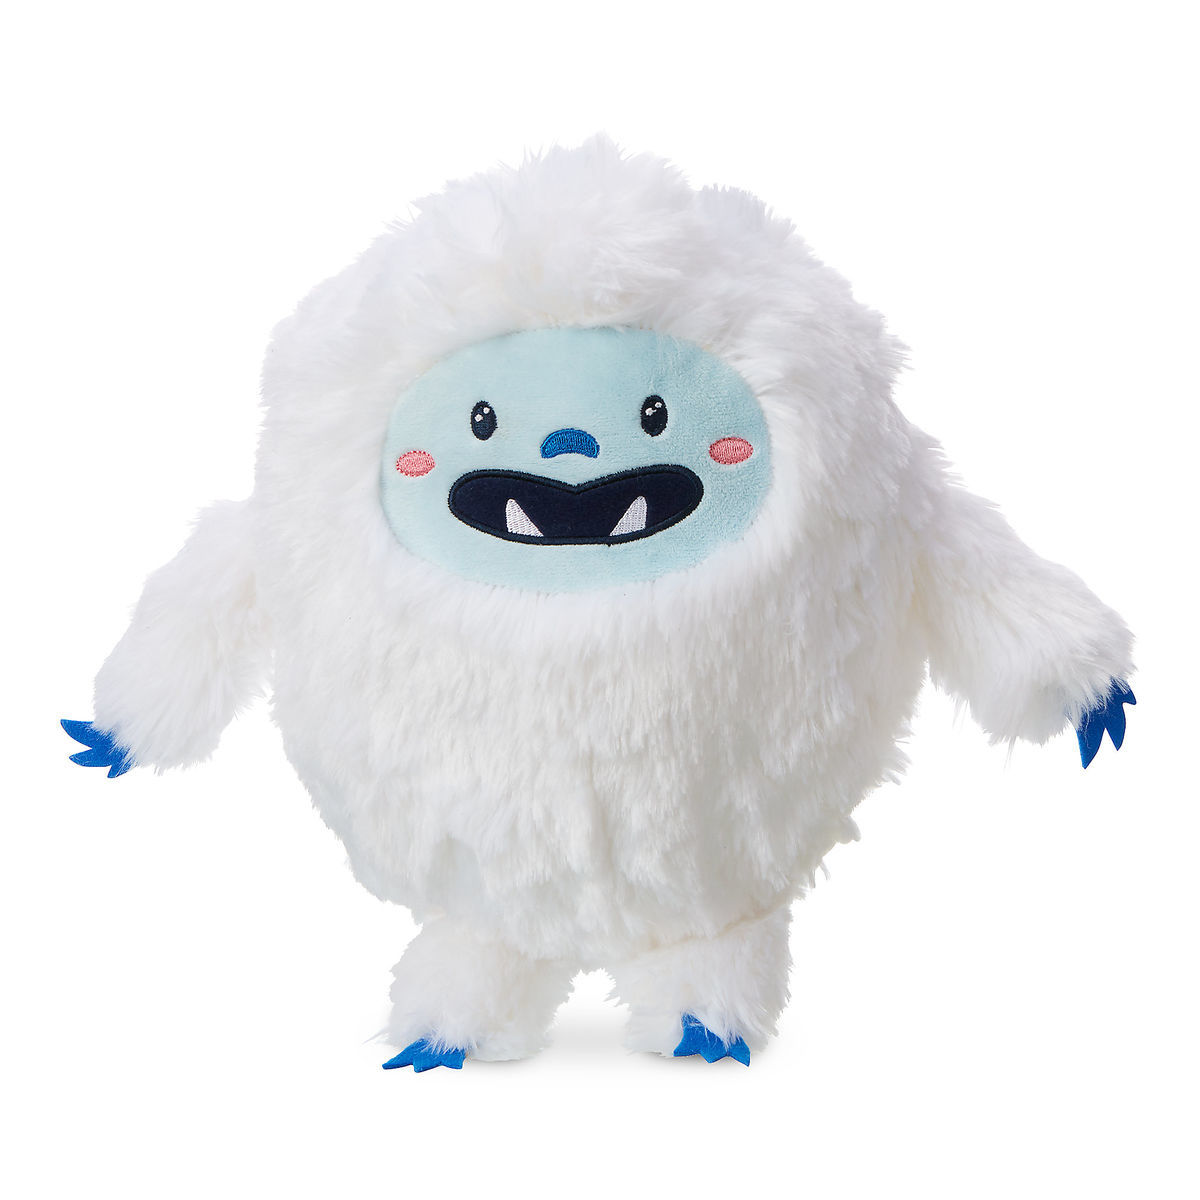 Everest Yeti